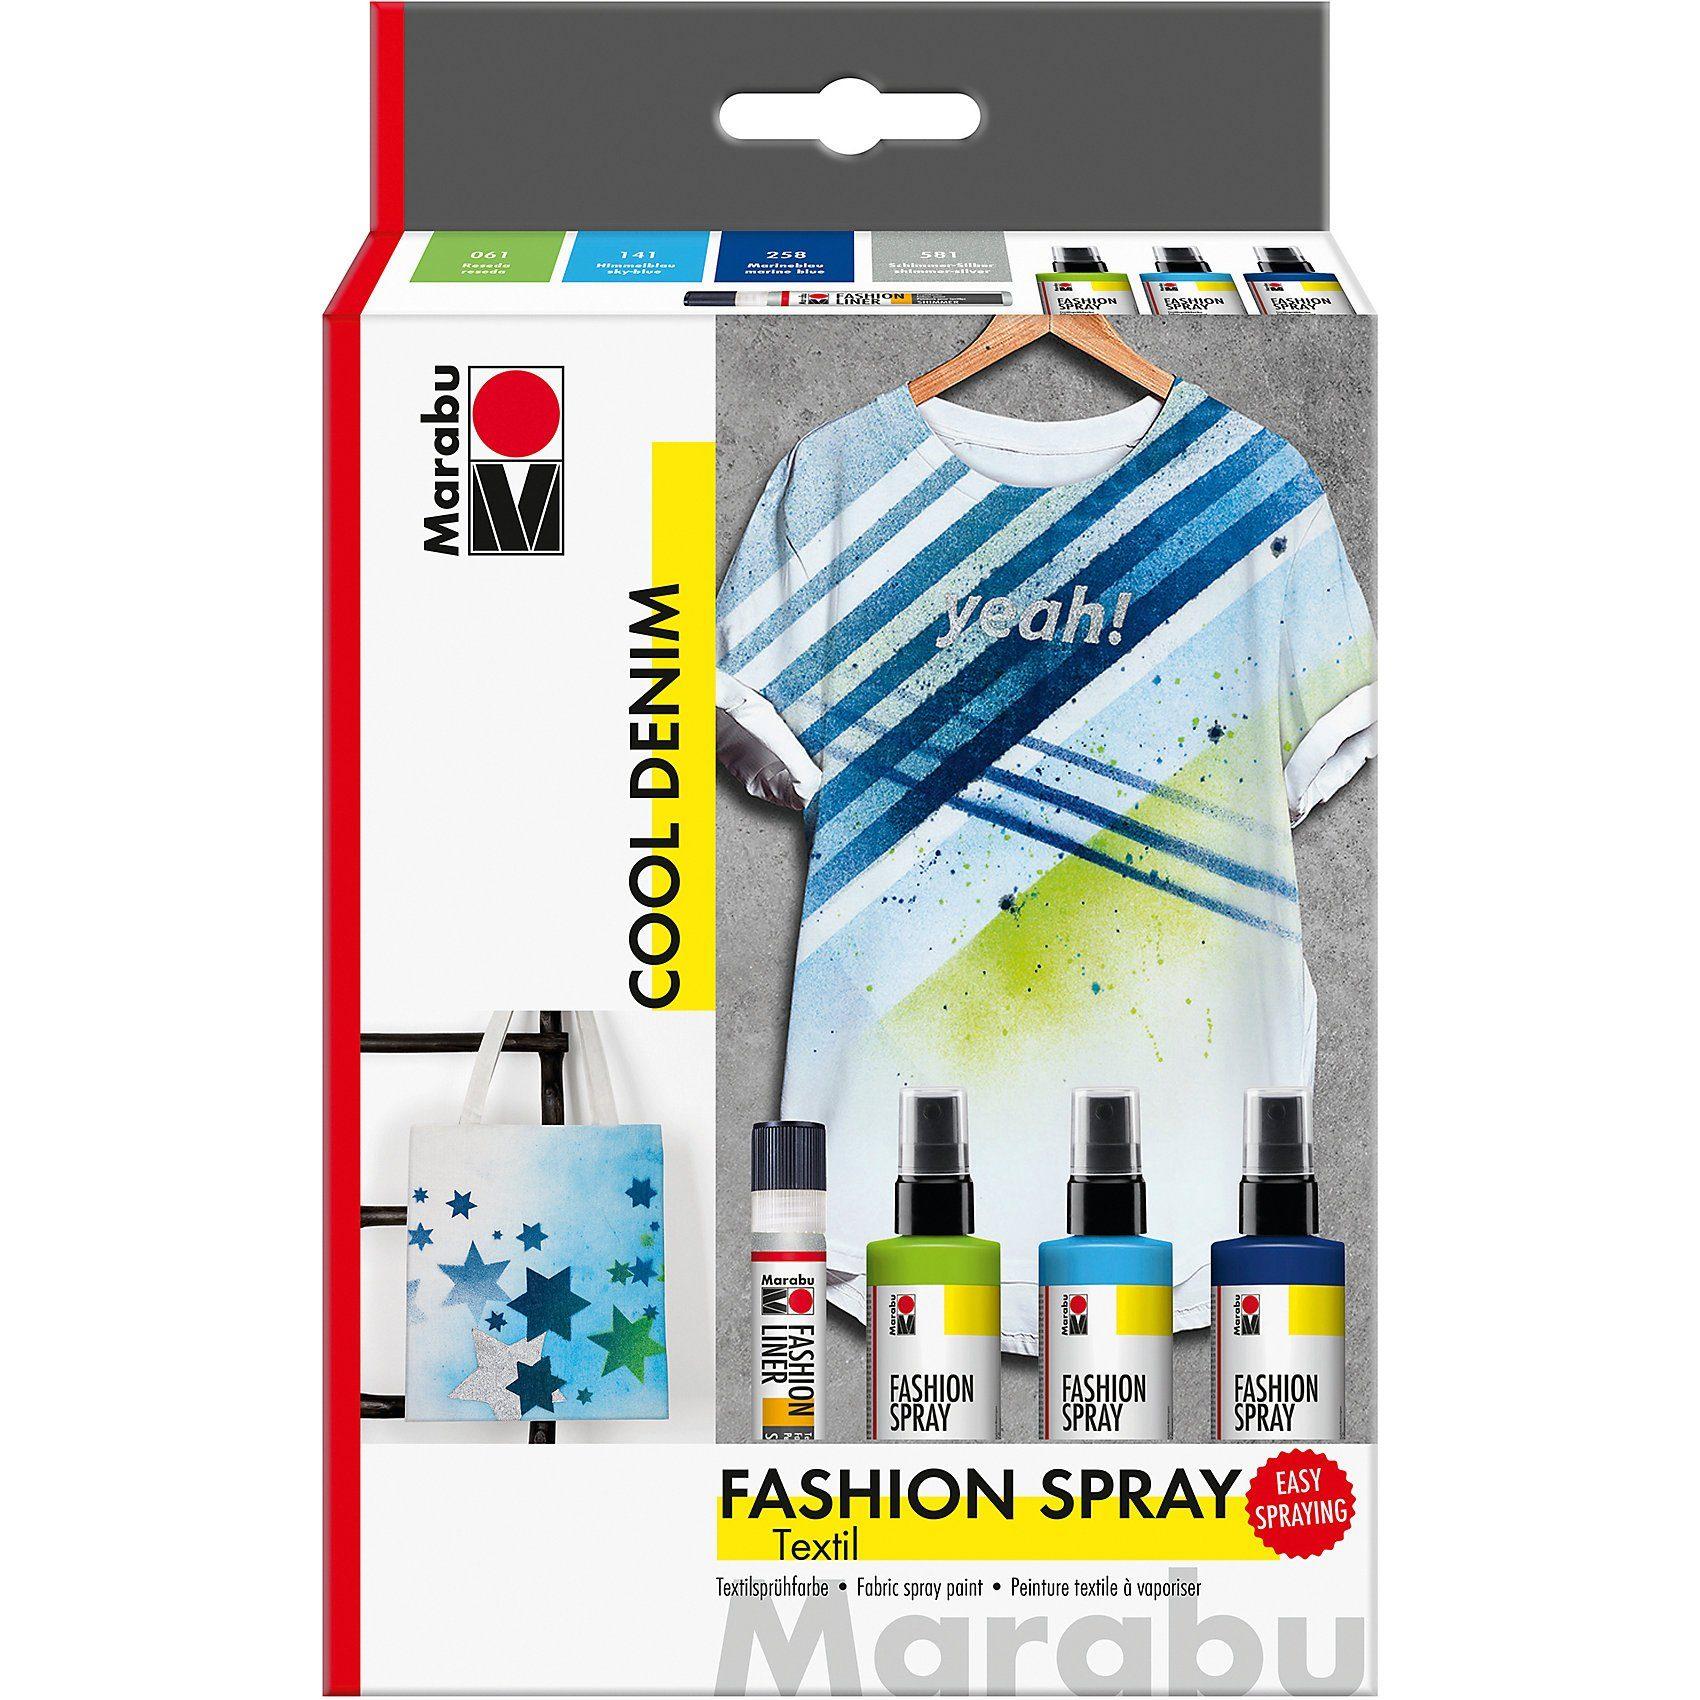 Marabu Fashion-Spray Cool Denim Textilsprühfarbe, 4-tlg.